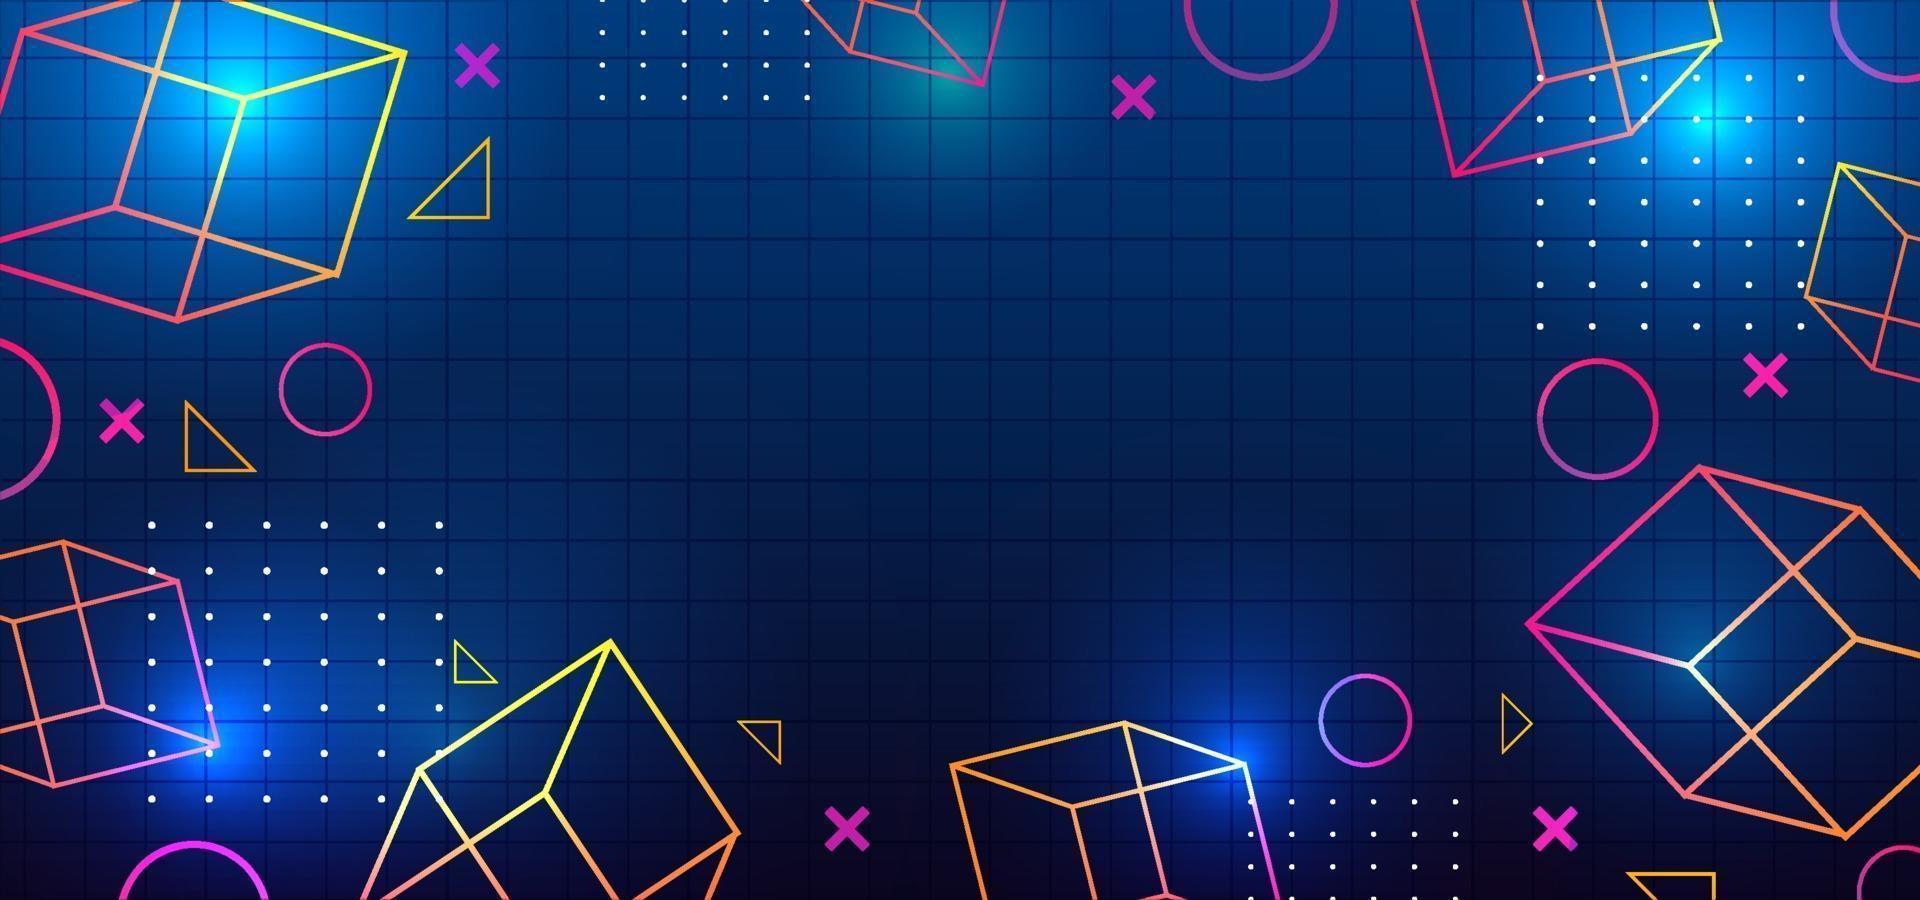 fundo moderno dos anos 80 memphis geométrico neon estilo brilhante vetor